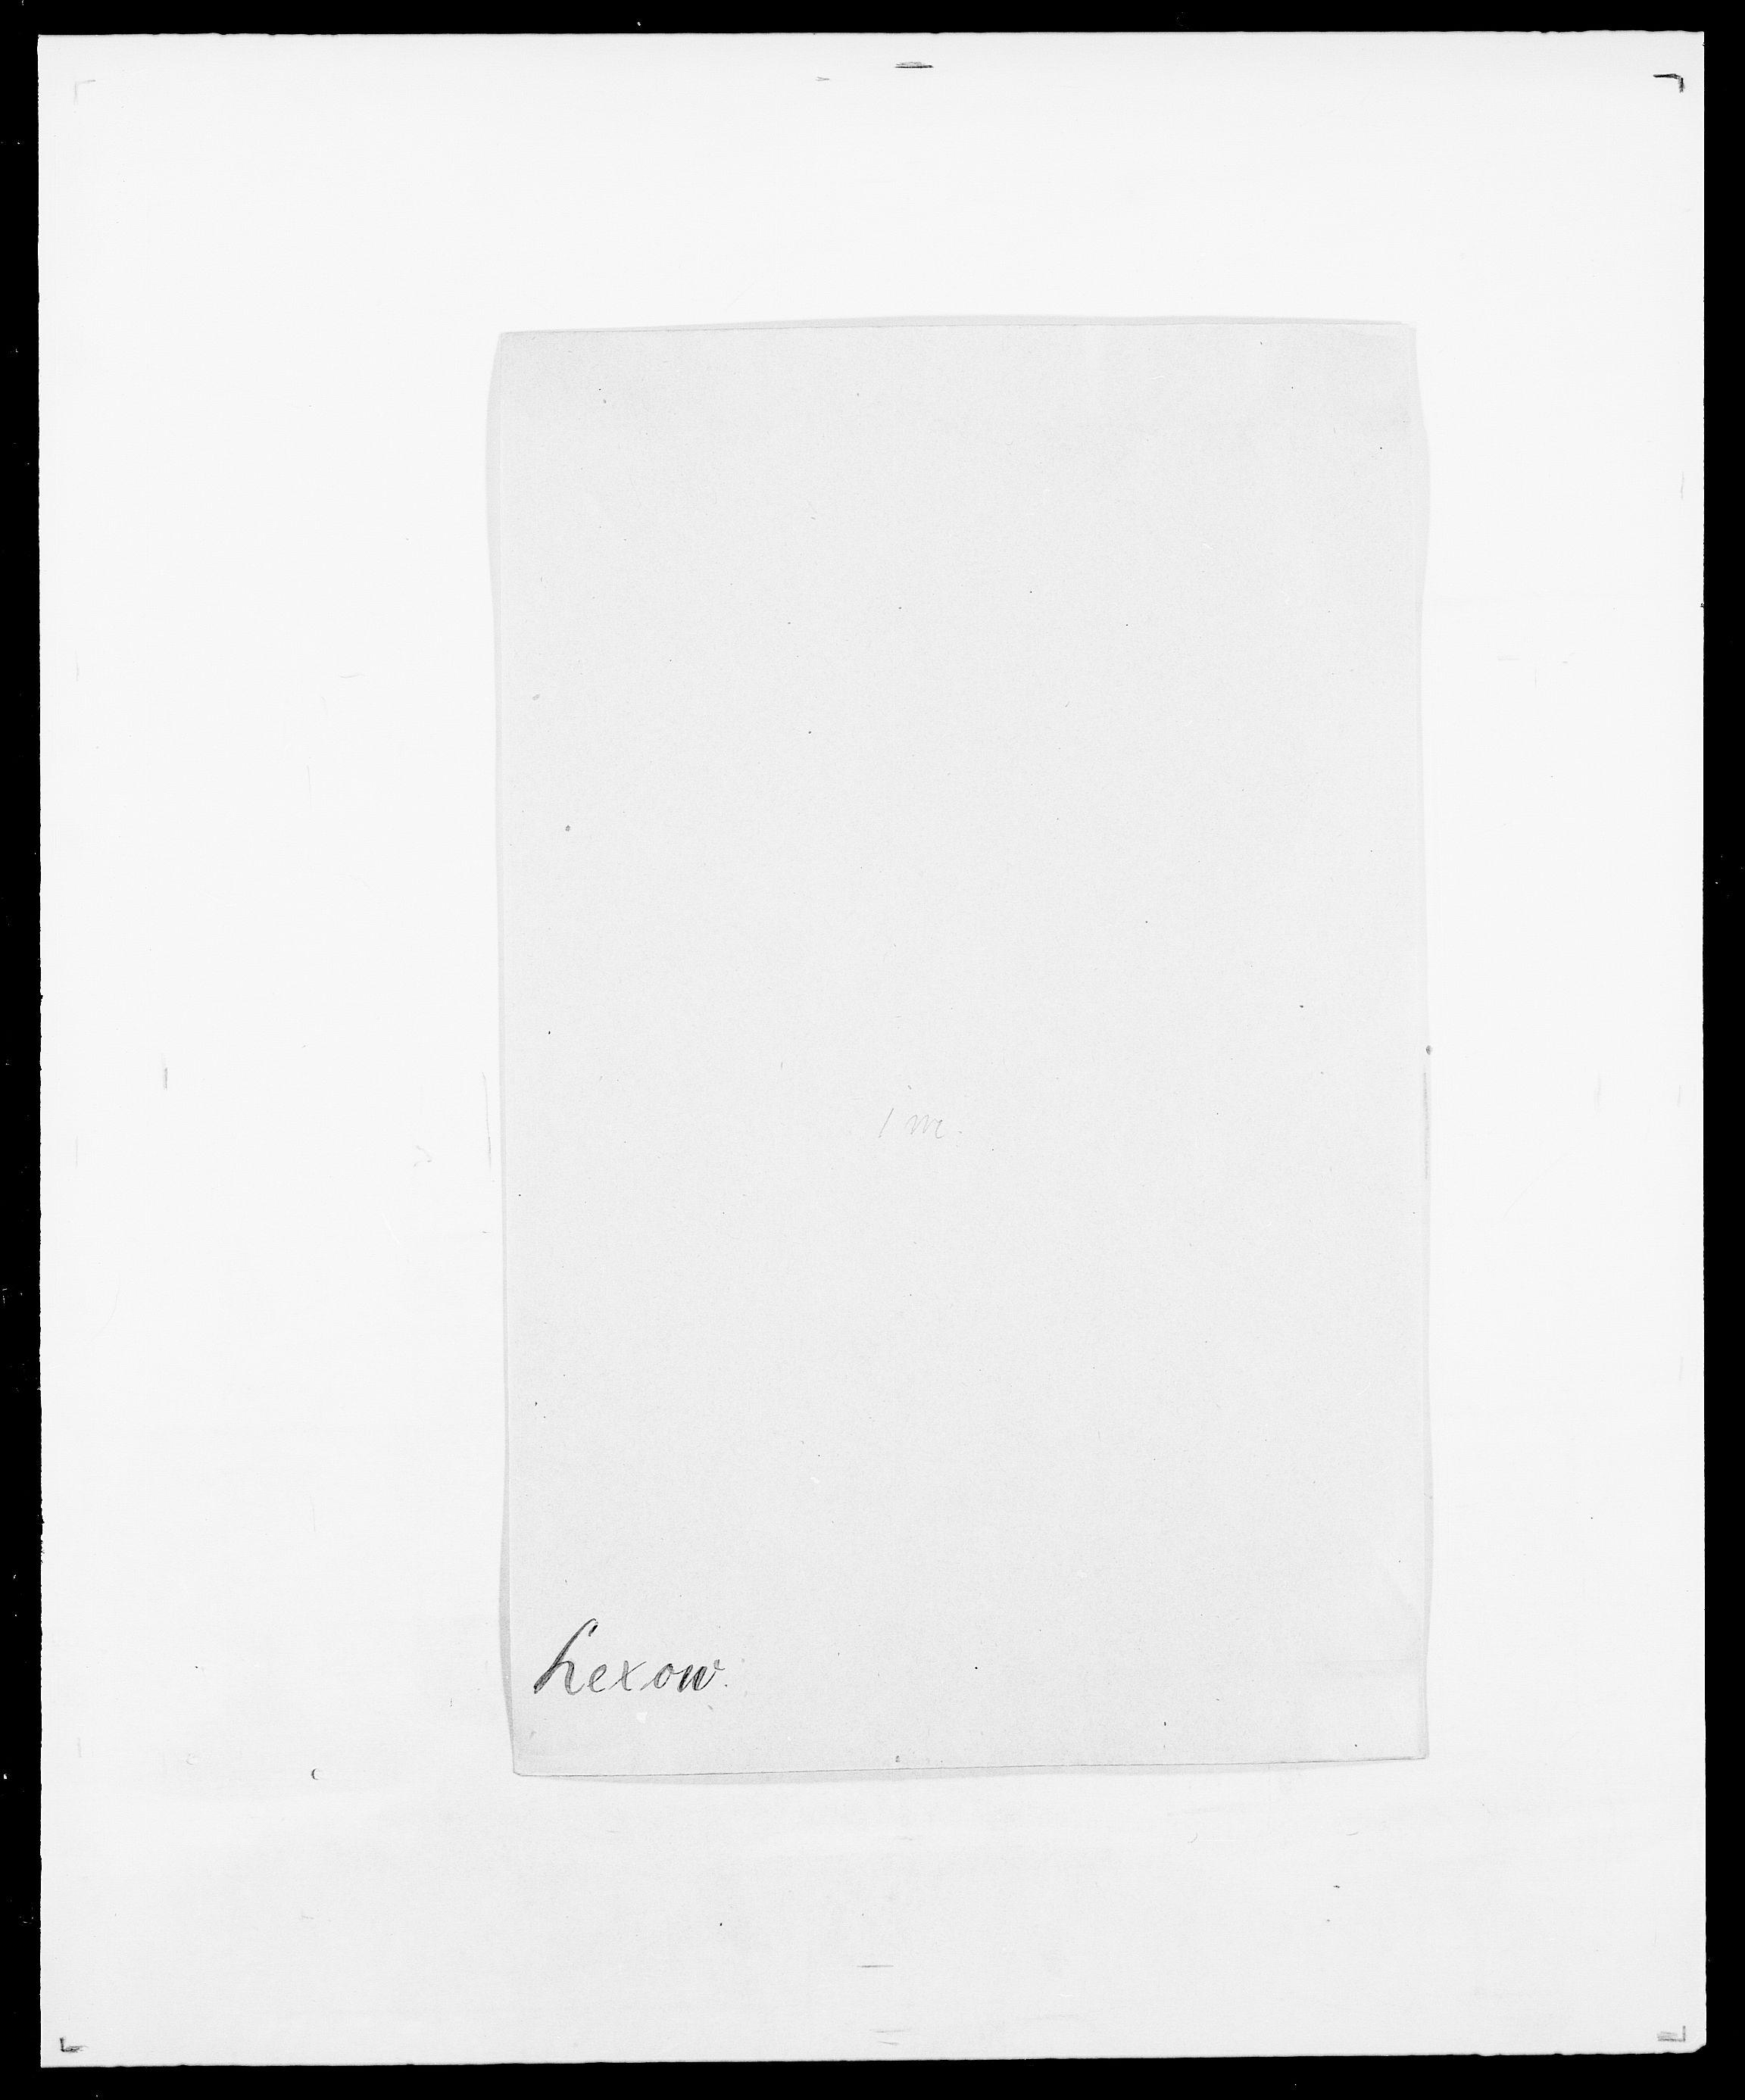 SAO, Delgobe, Charles Antoine - samling, D/Da/L0023: Lau - Lirvyn, s. 310